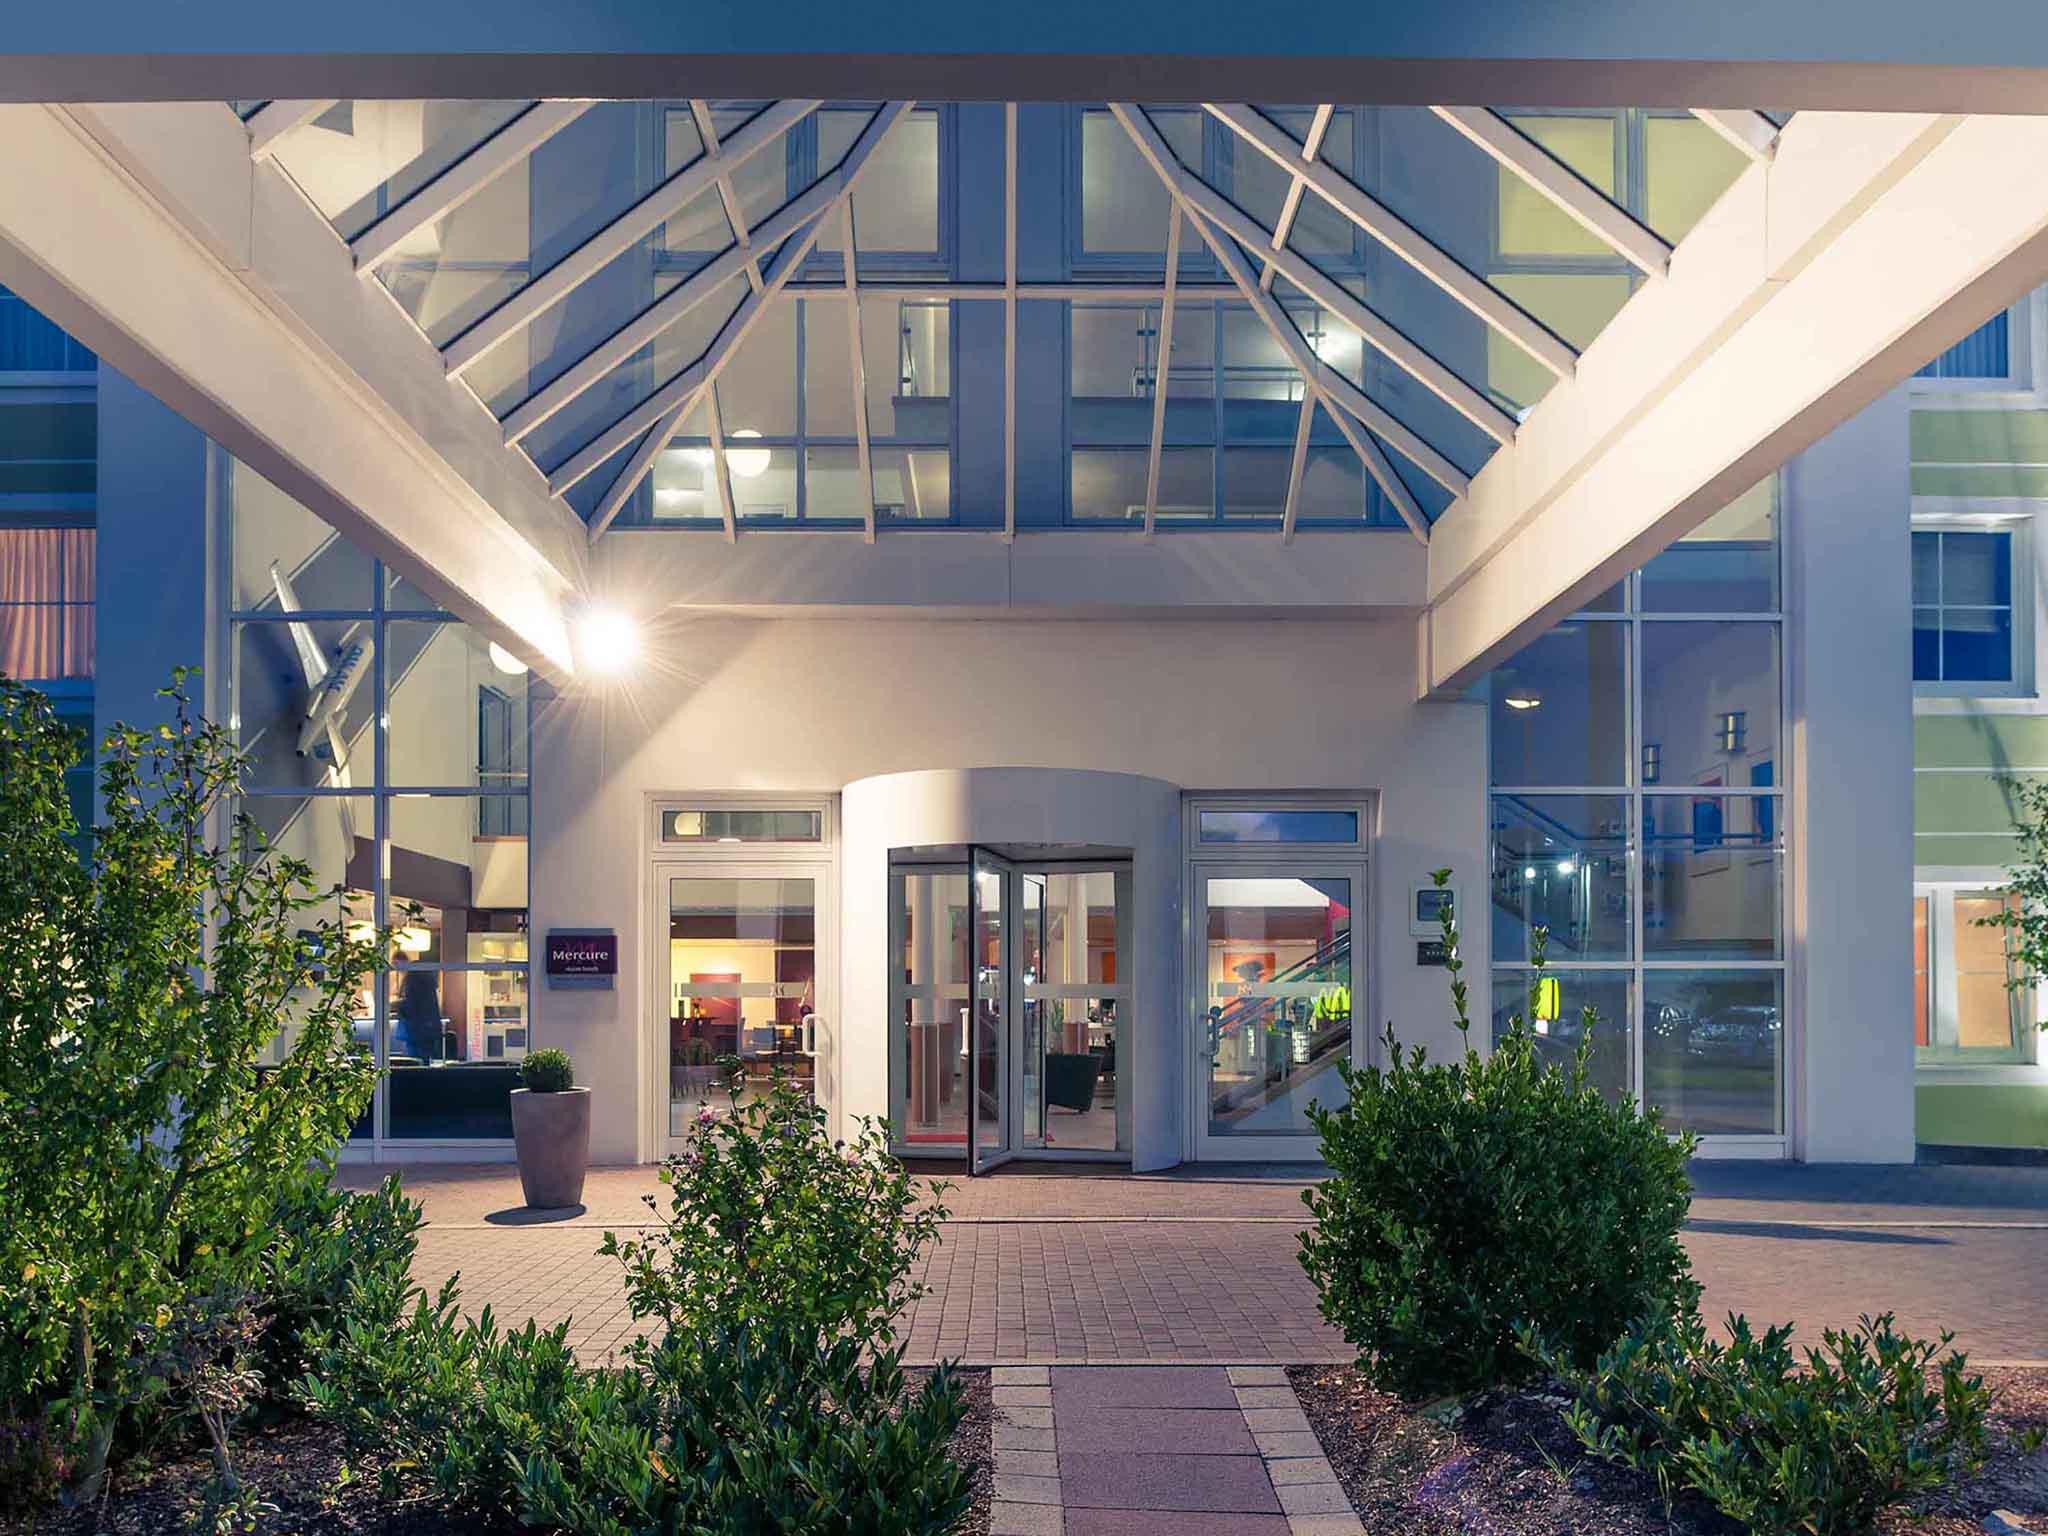 فندق - فندق مركيور Mercure دوسلدورف راتنجن